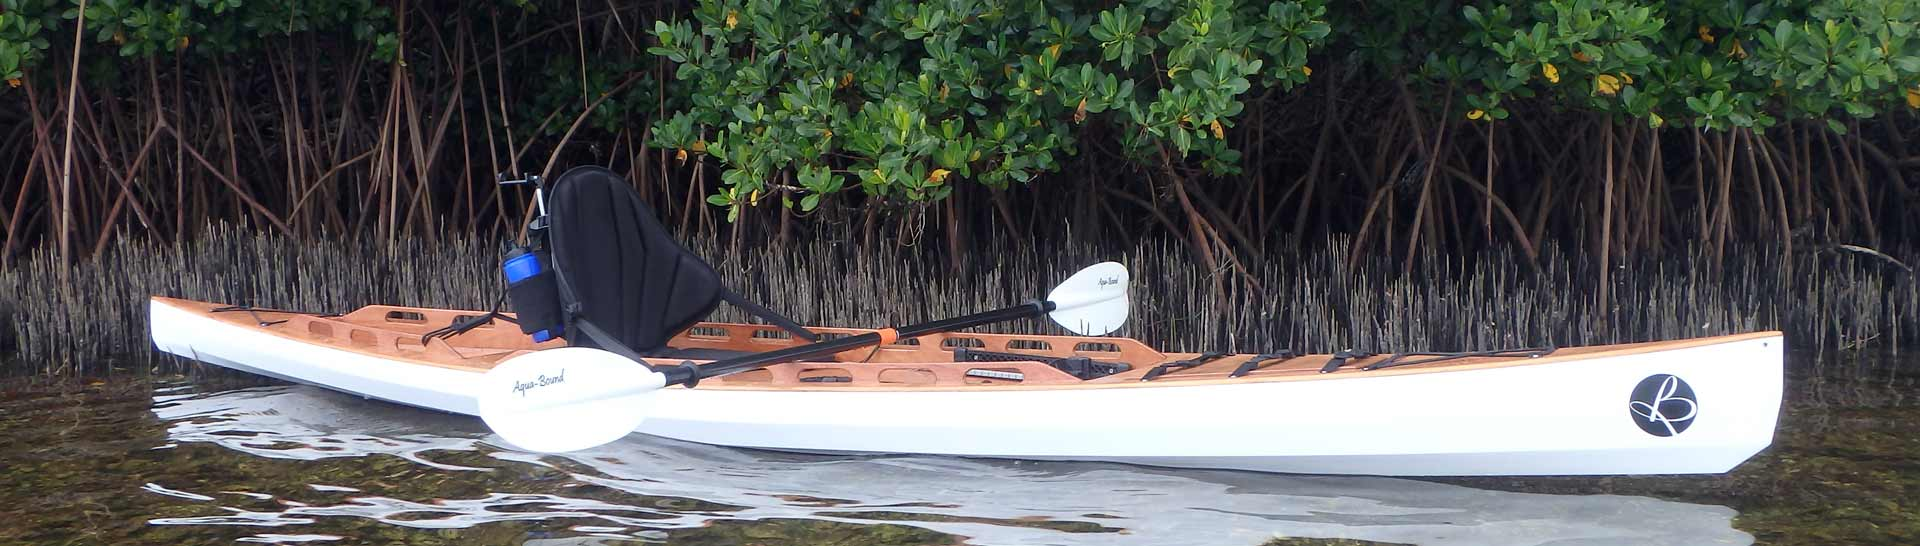 Fishing Yak wooden stitch&glue Bedard Yacht Design SOT kayak